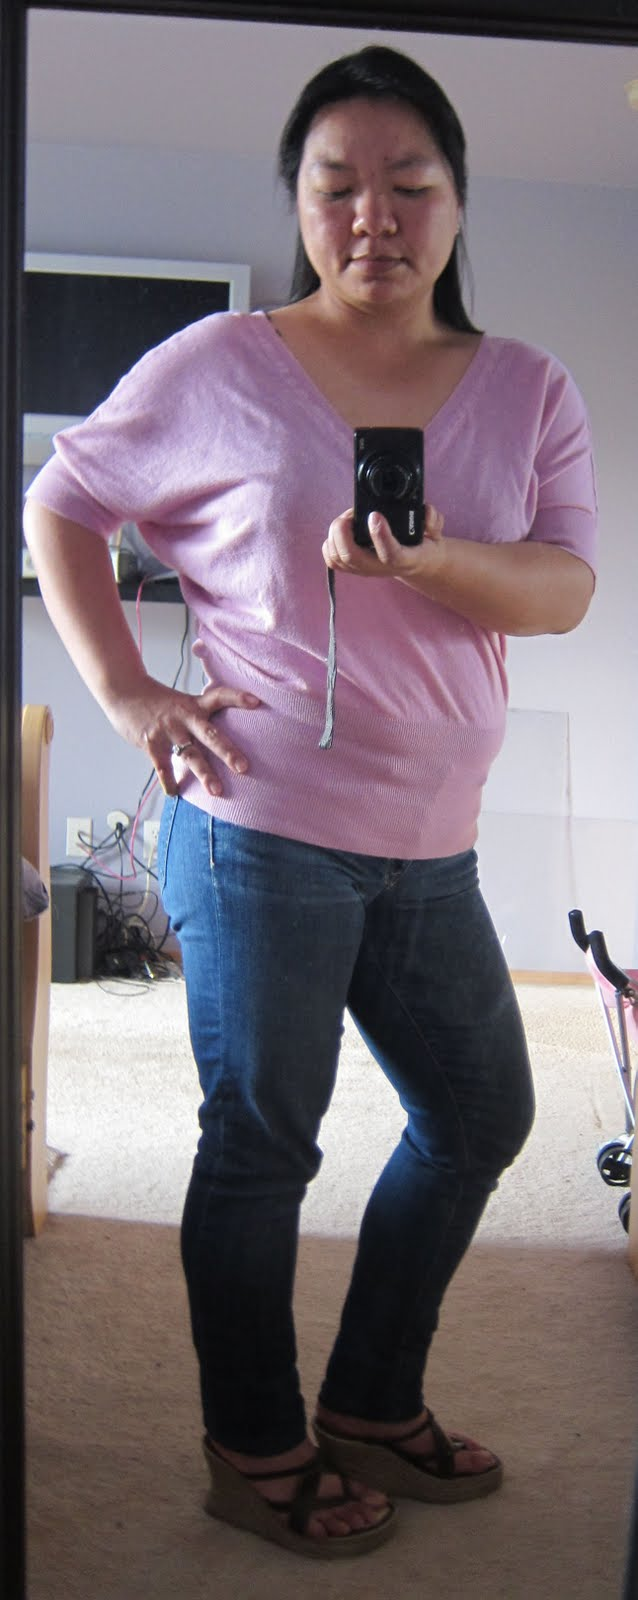 Fat People Wearing Skinny Jeans - Bing images